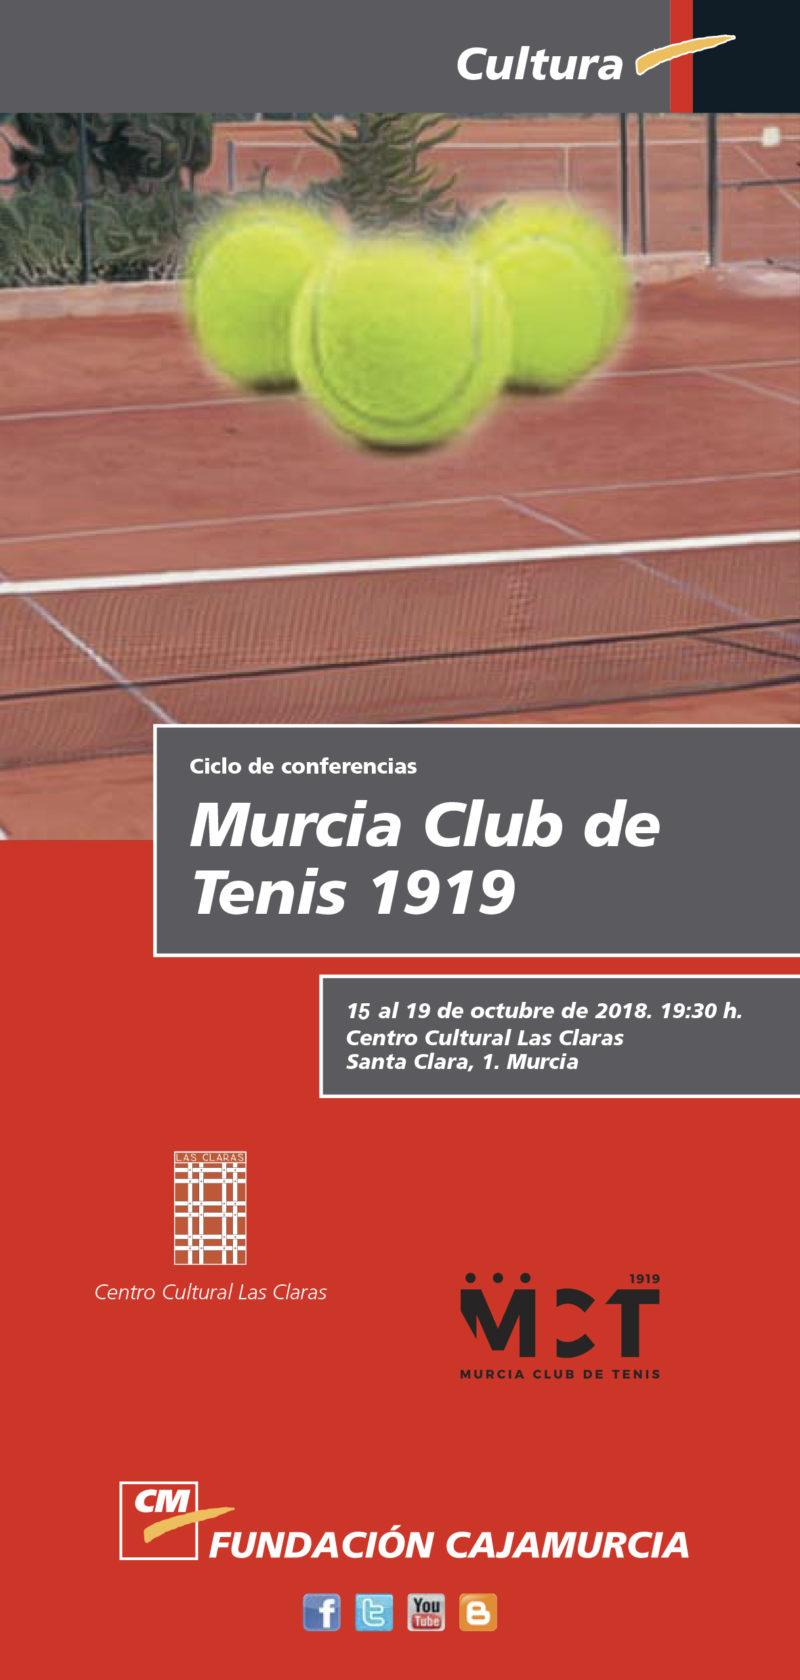 brand new 6655a 97bdc lam-conf-murcia-club-tenis-cleaned-1-800x1680-2.jpg